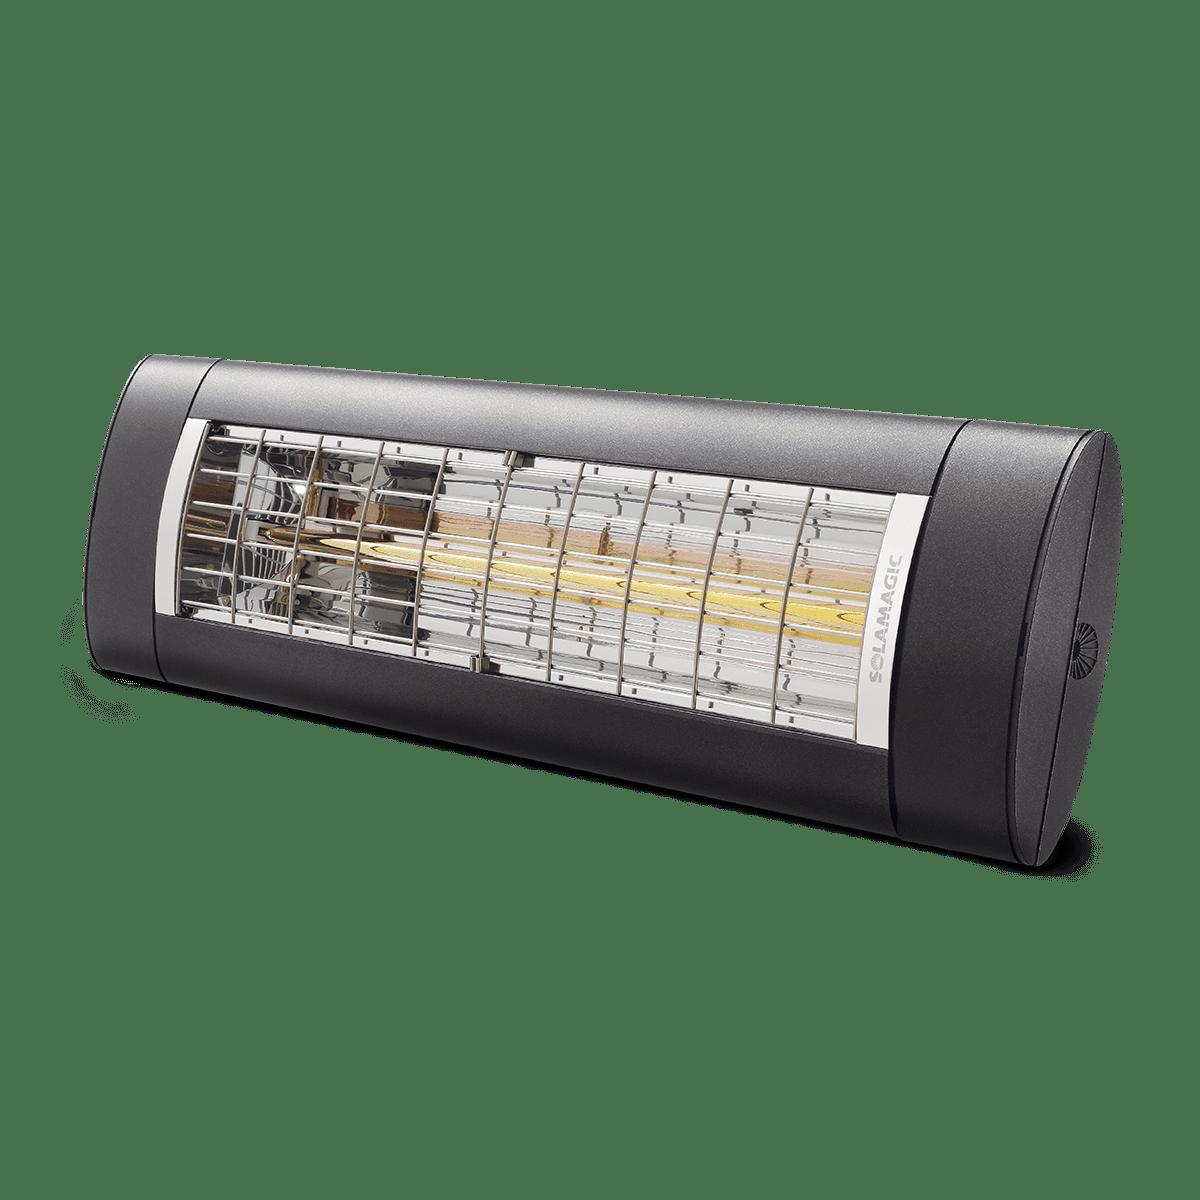 Solamagic teressevarmer PREMIUM_2500_Anthracite_low